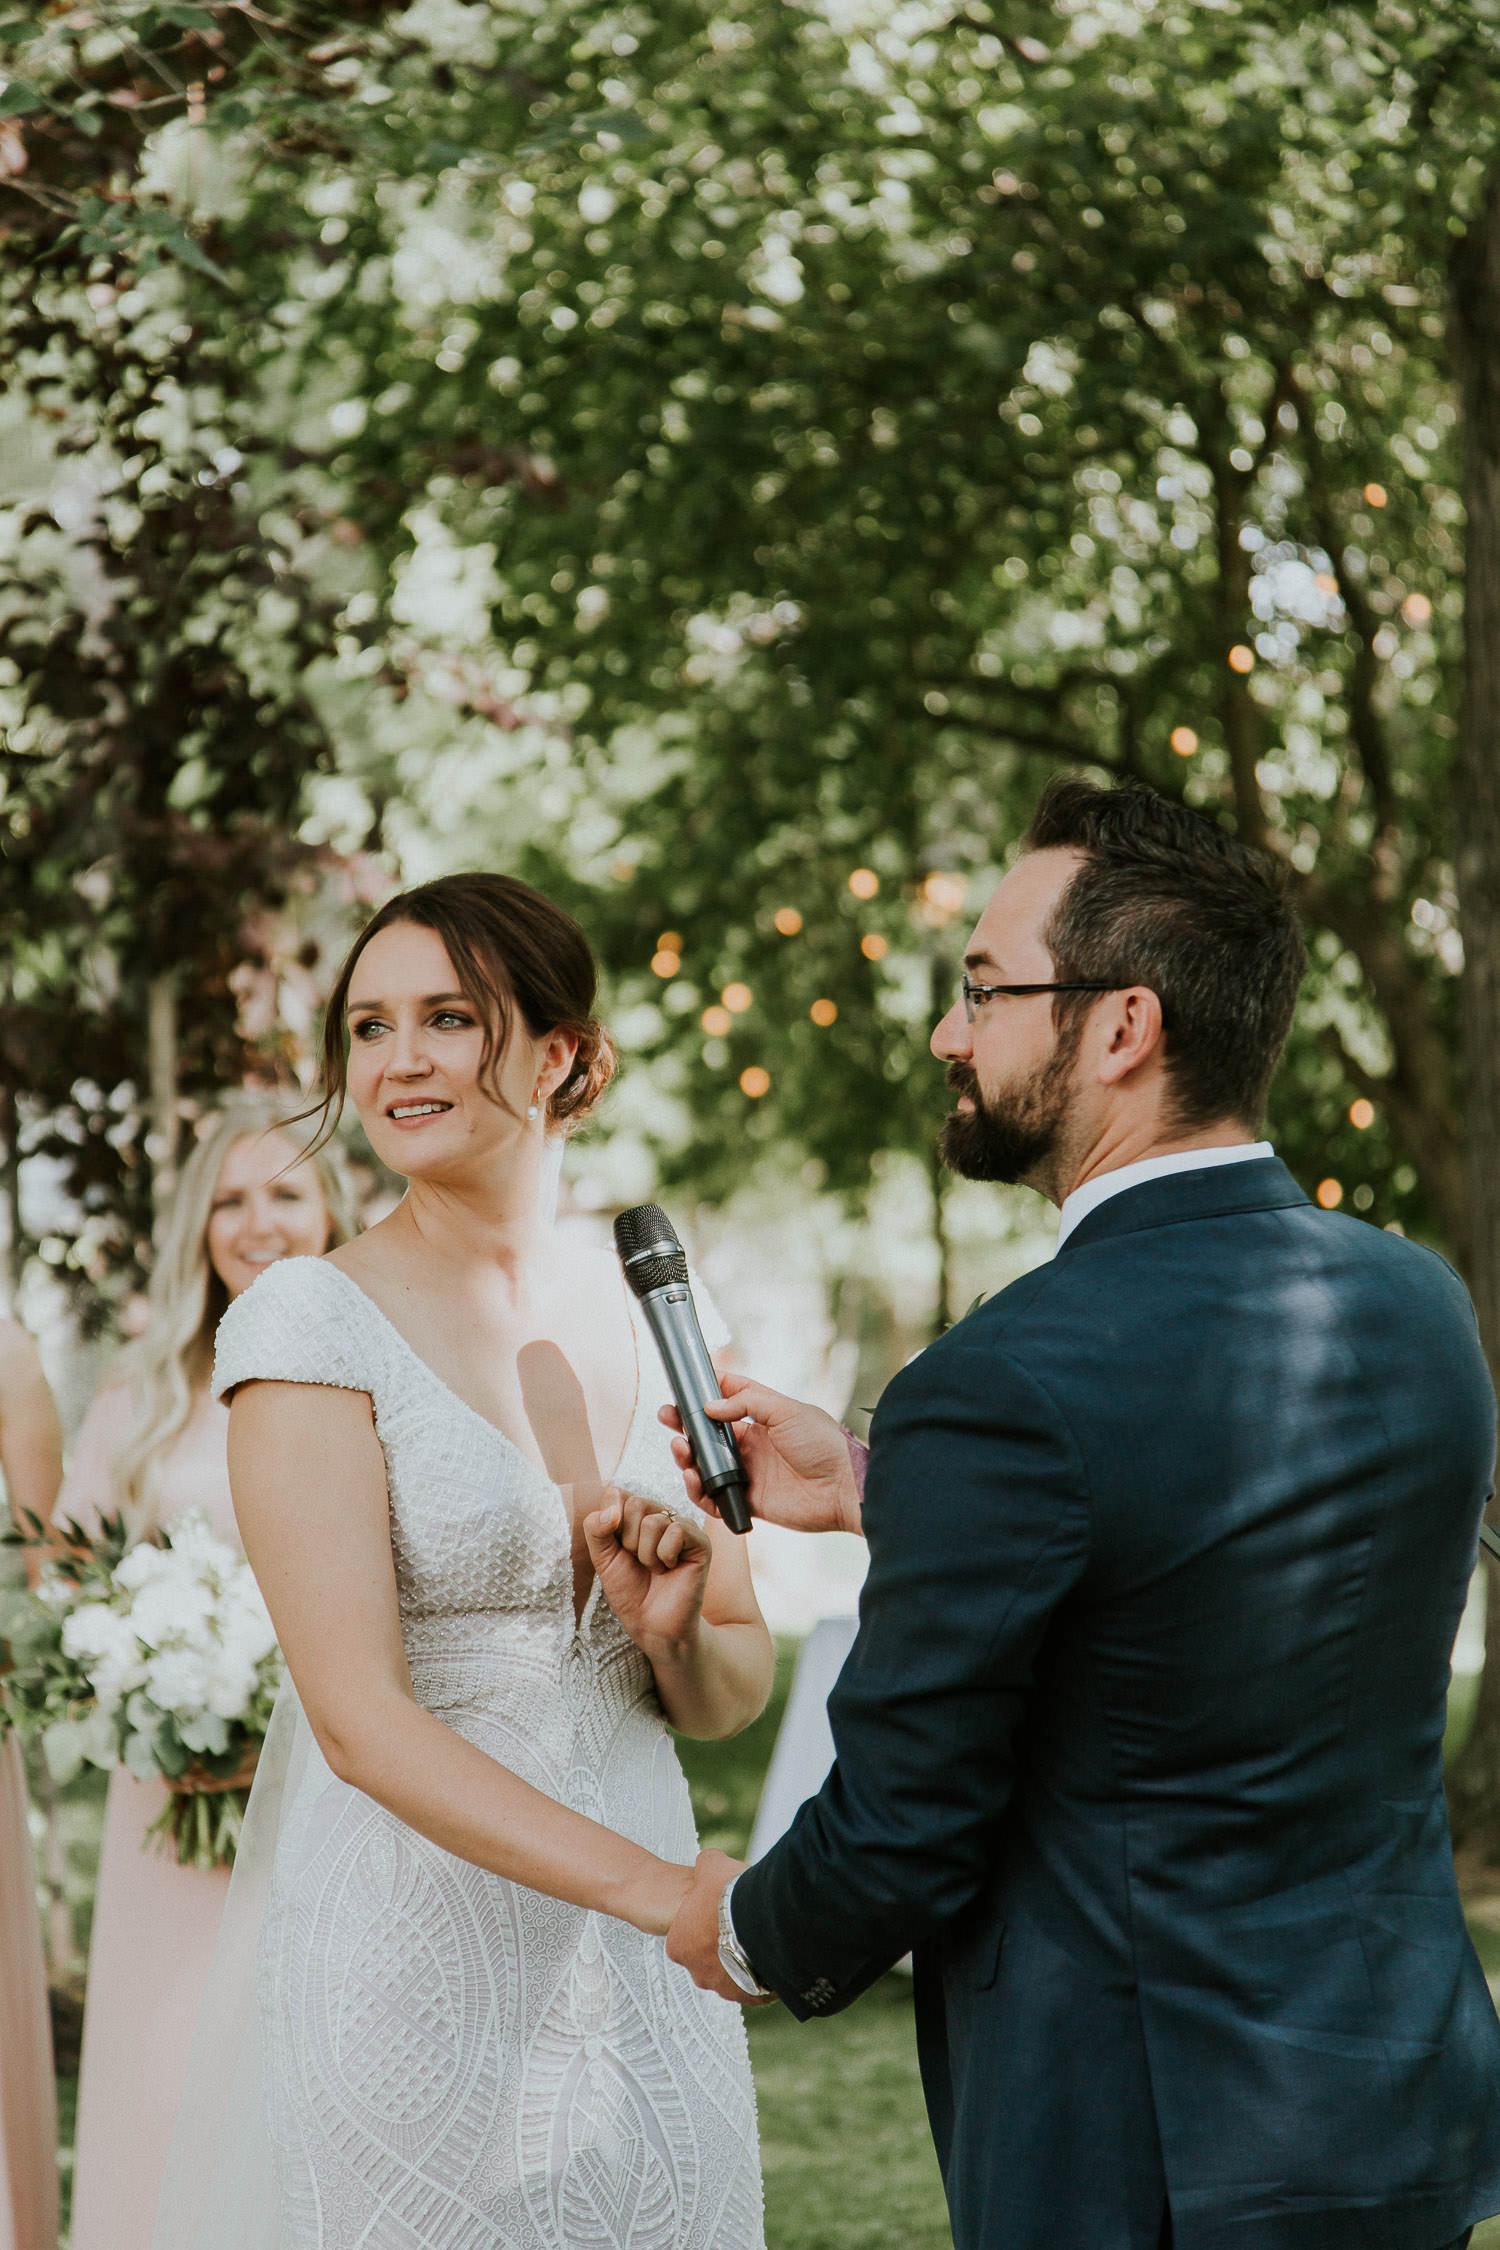 summer-backyard-wedding-in-alberta-sarah-pukin-0098